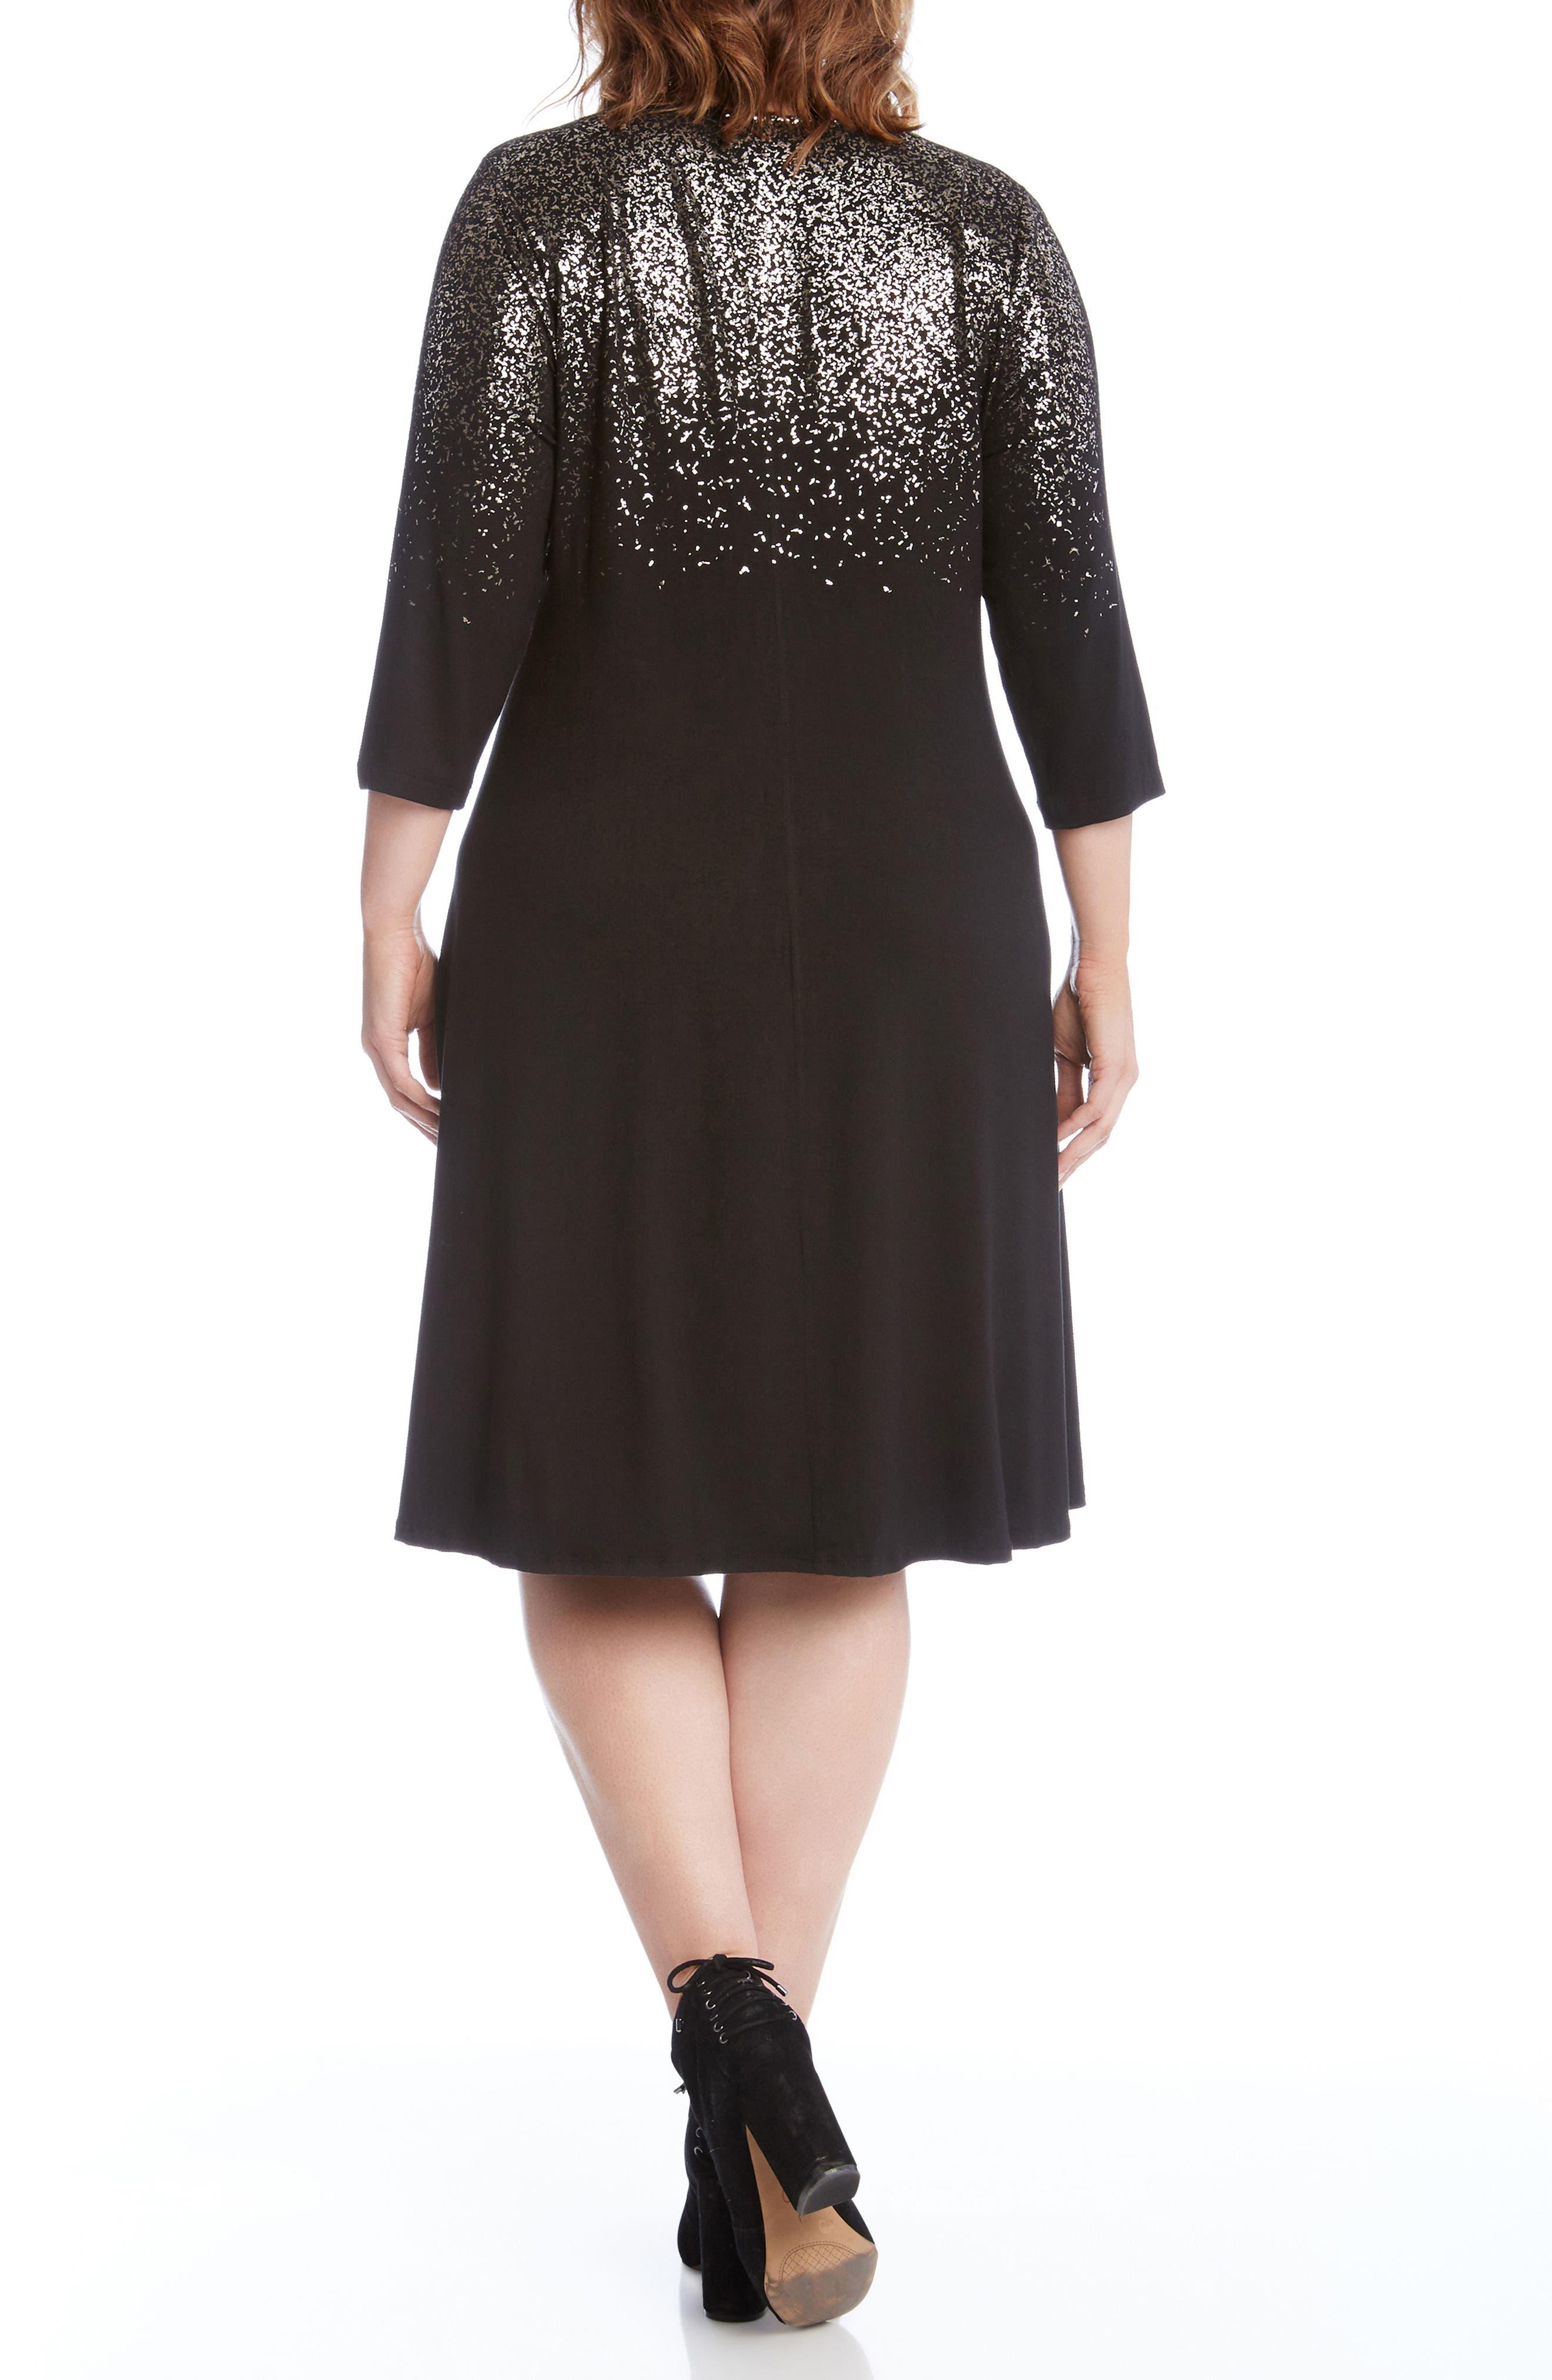 Speckled Print A-Line Dress,                             Alternate thumbnail 2, color,